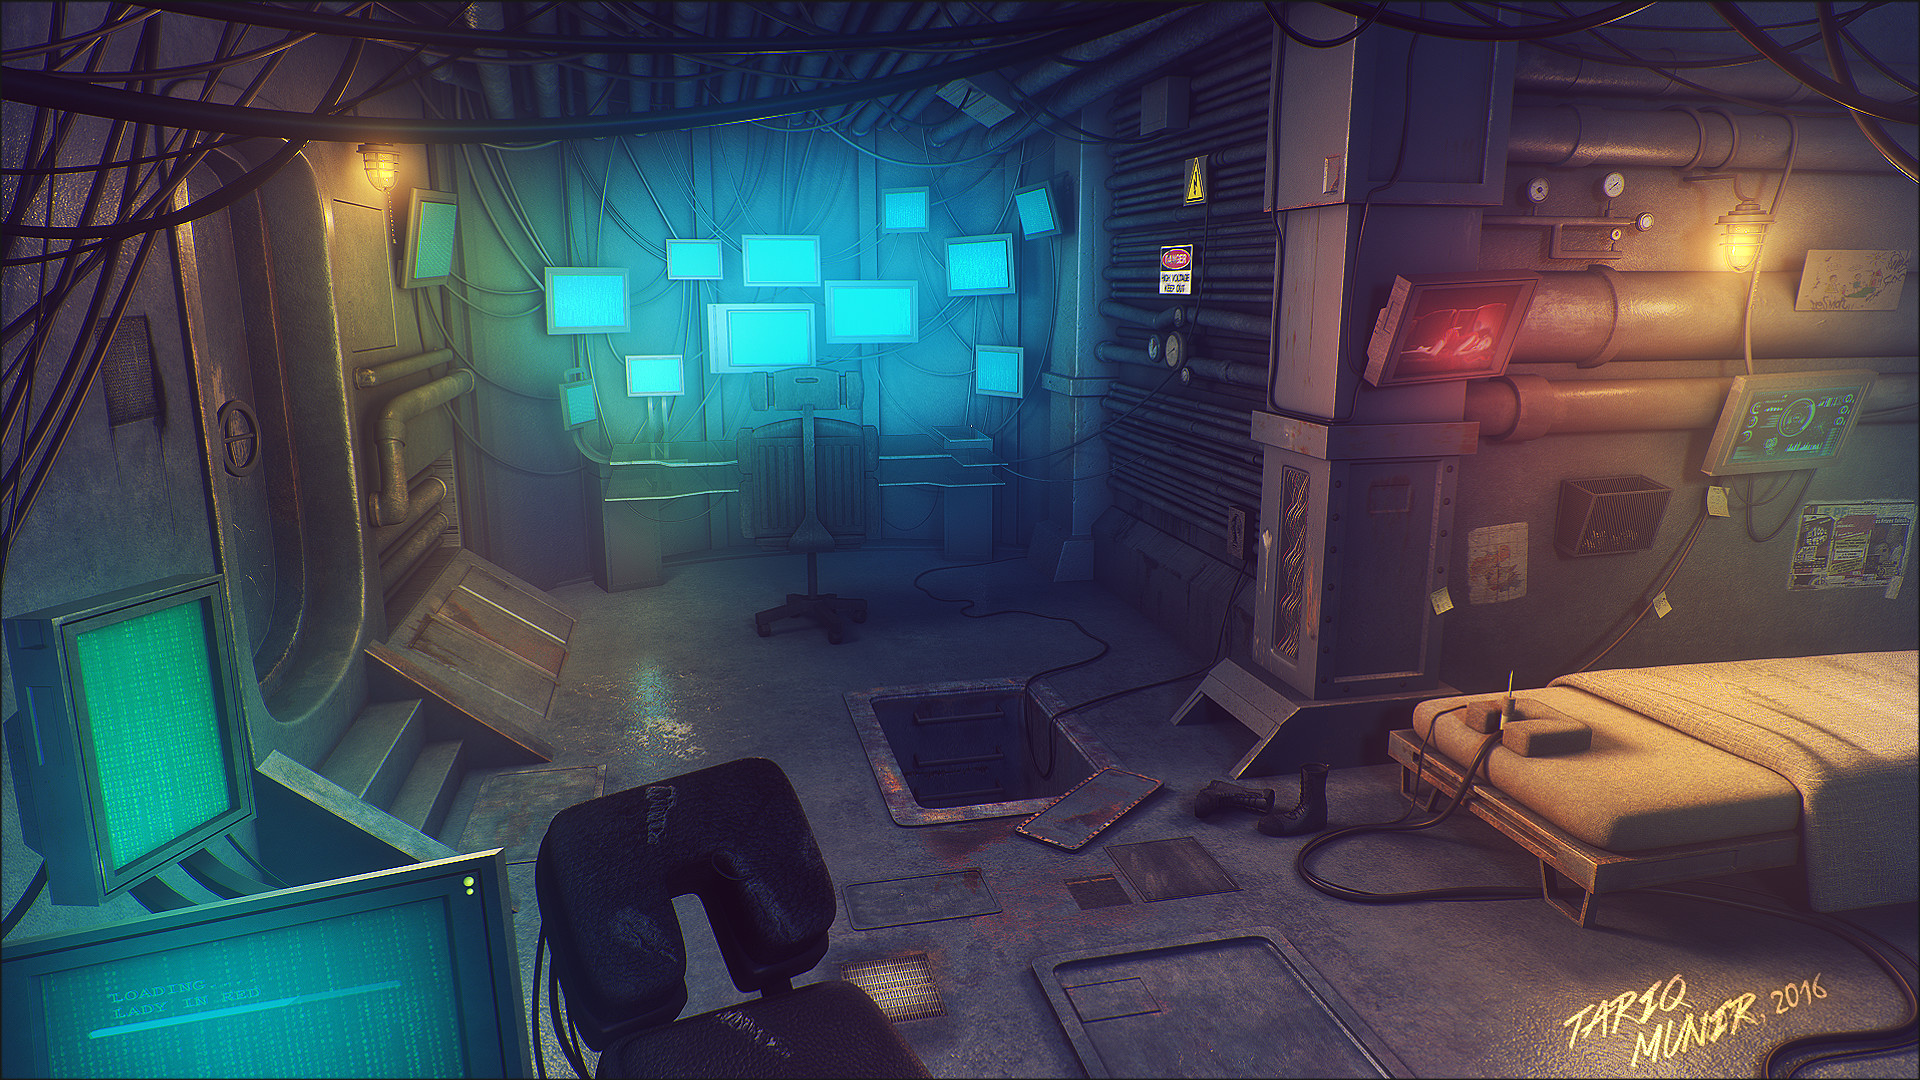 3d Animated Horror Wallpaper Artstation Cyberpunk Room Tariq Munir